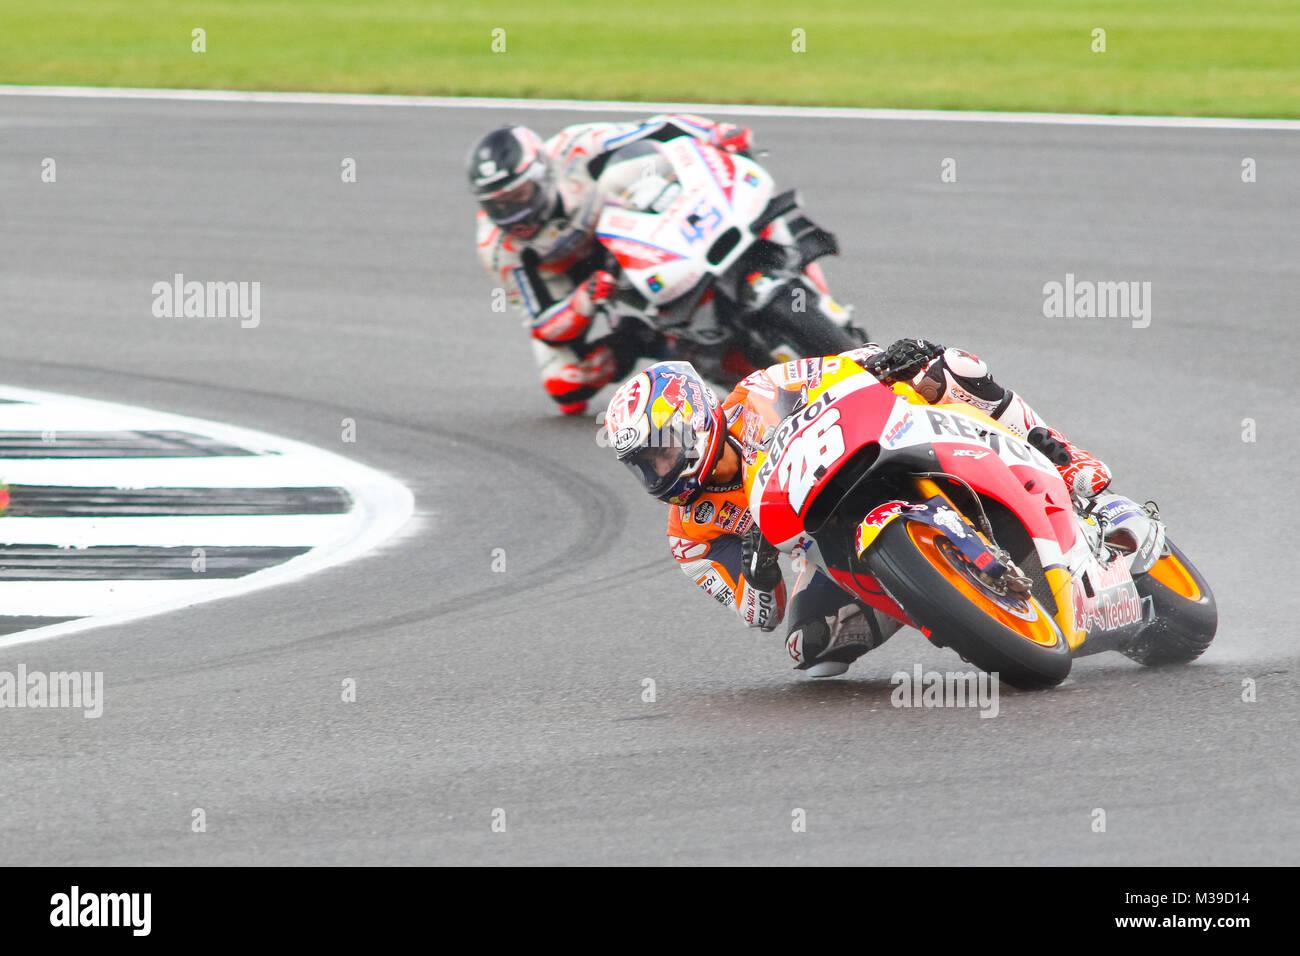 Danni Pedrosa Repsol Honda leads Scott Redding on the Pramac Ducati  during MotoGP Qualifying for the British Grand - Stock Image